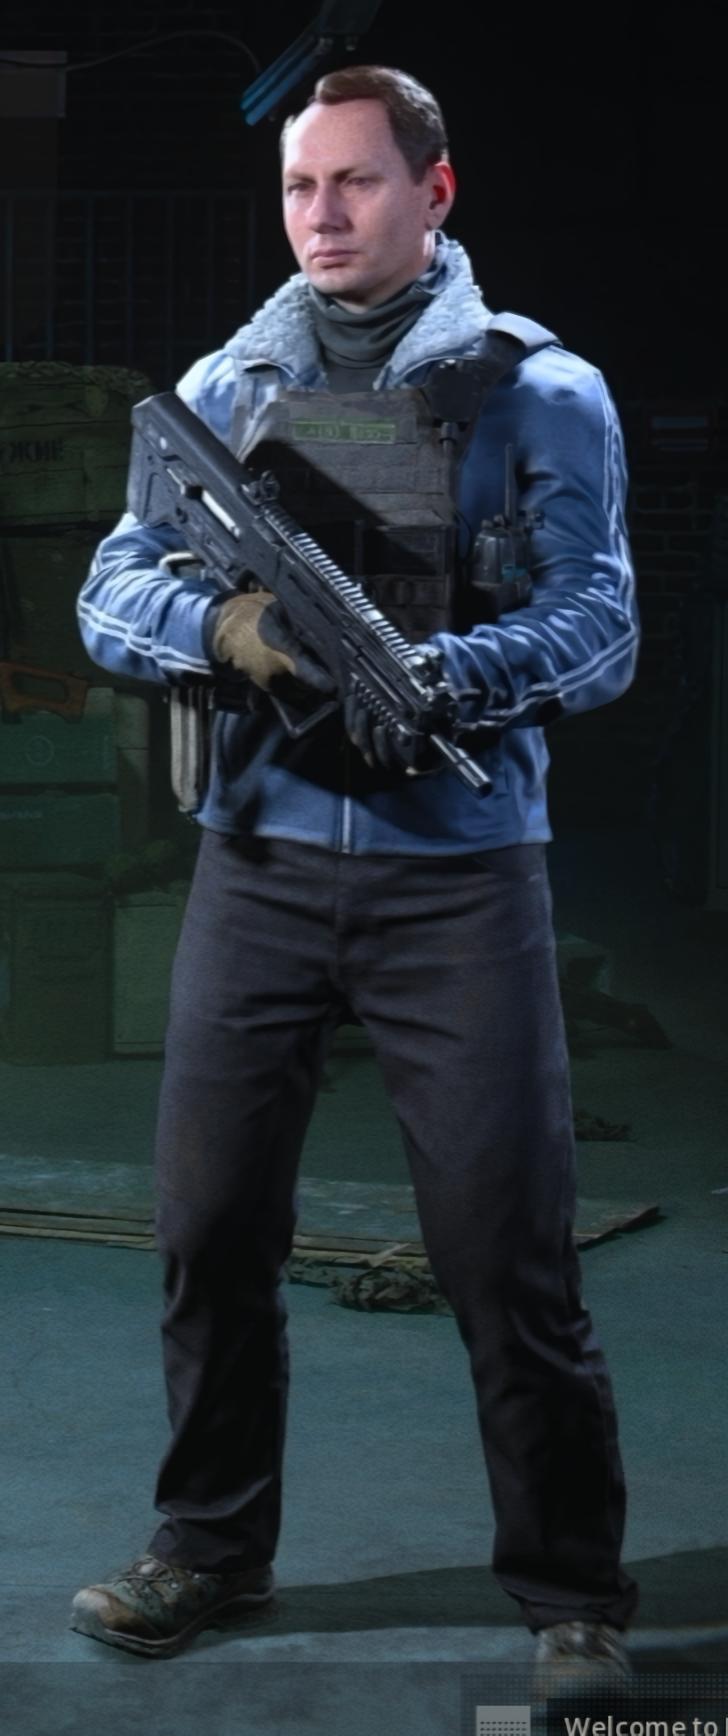 Yegor Novak Call Of Duty Wiki Fandom In 2020 Call Of Duty Modern Warfare Crime Family